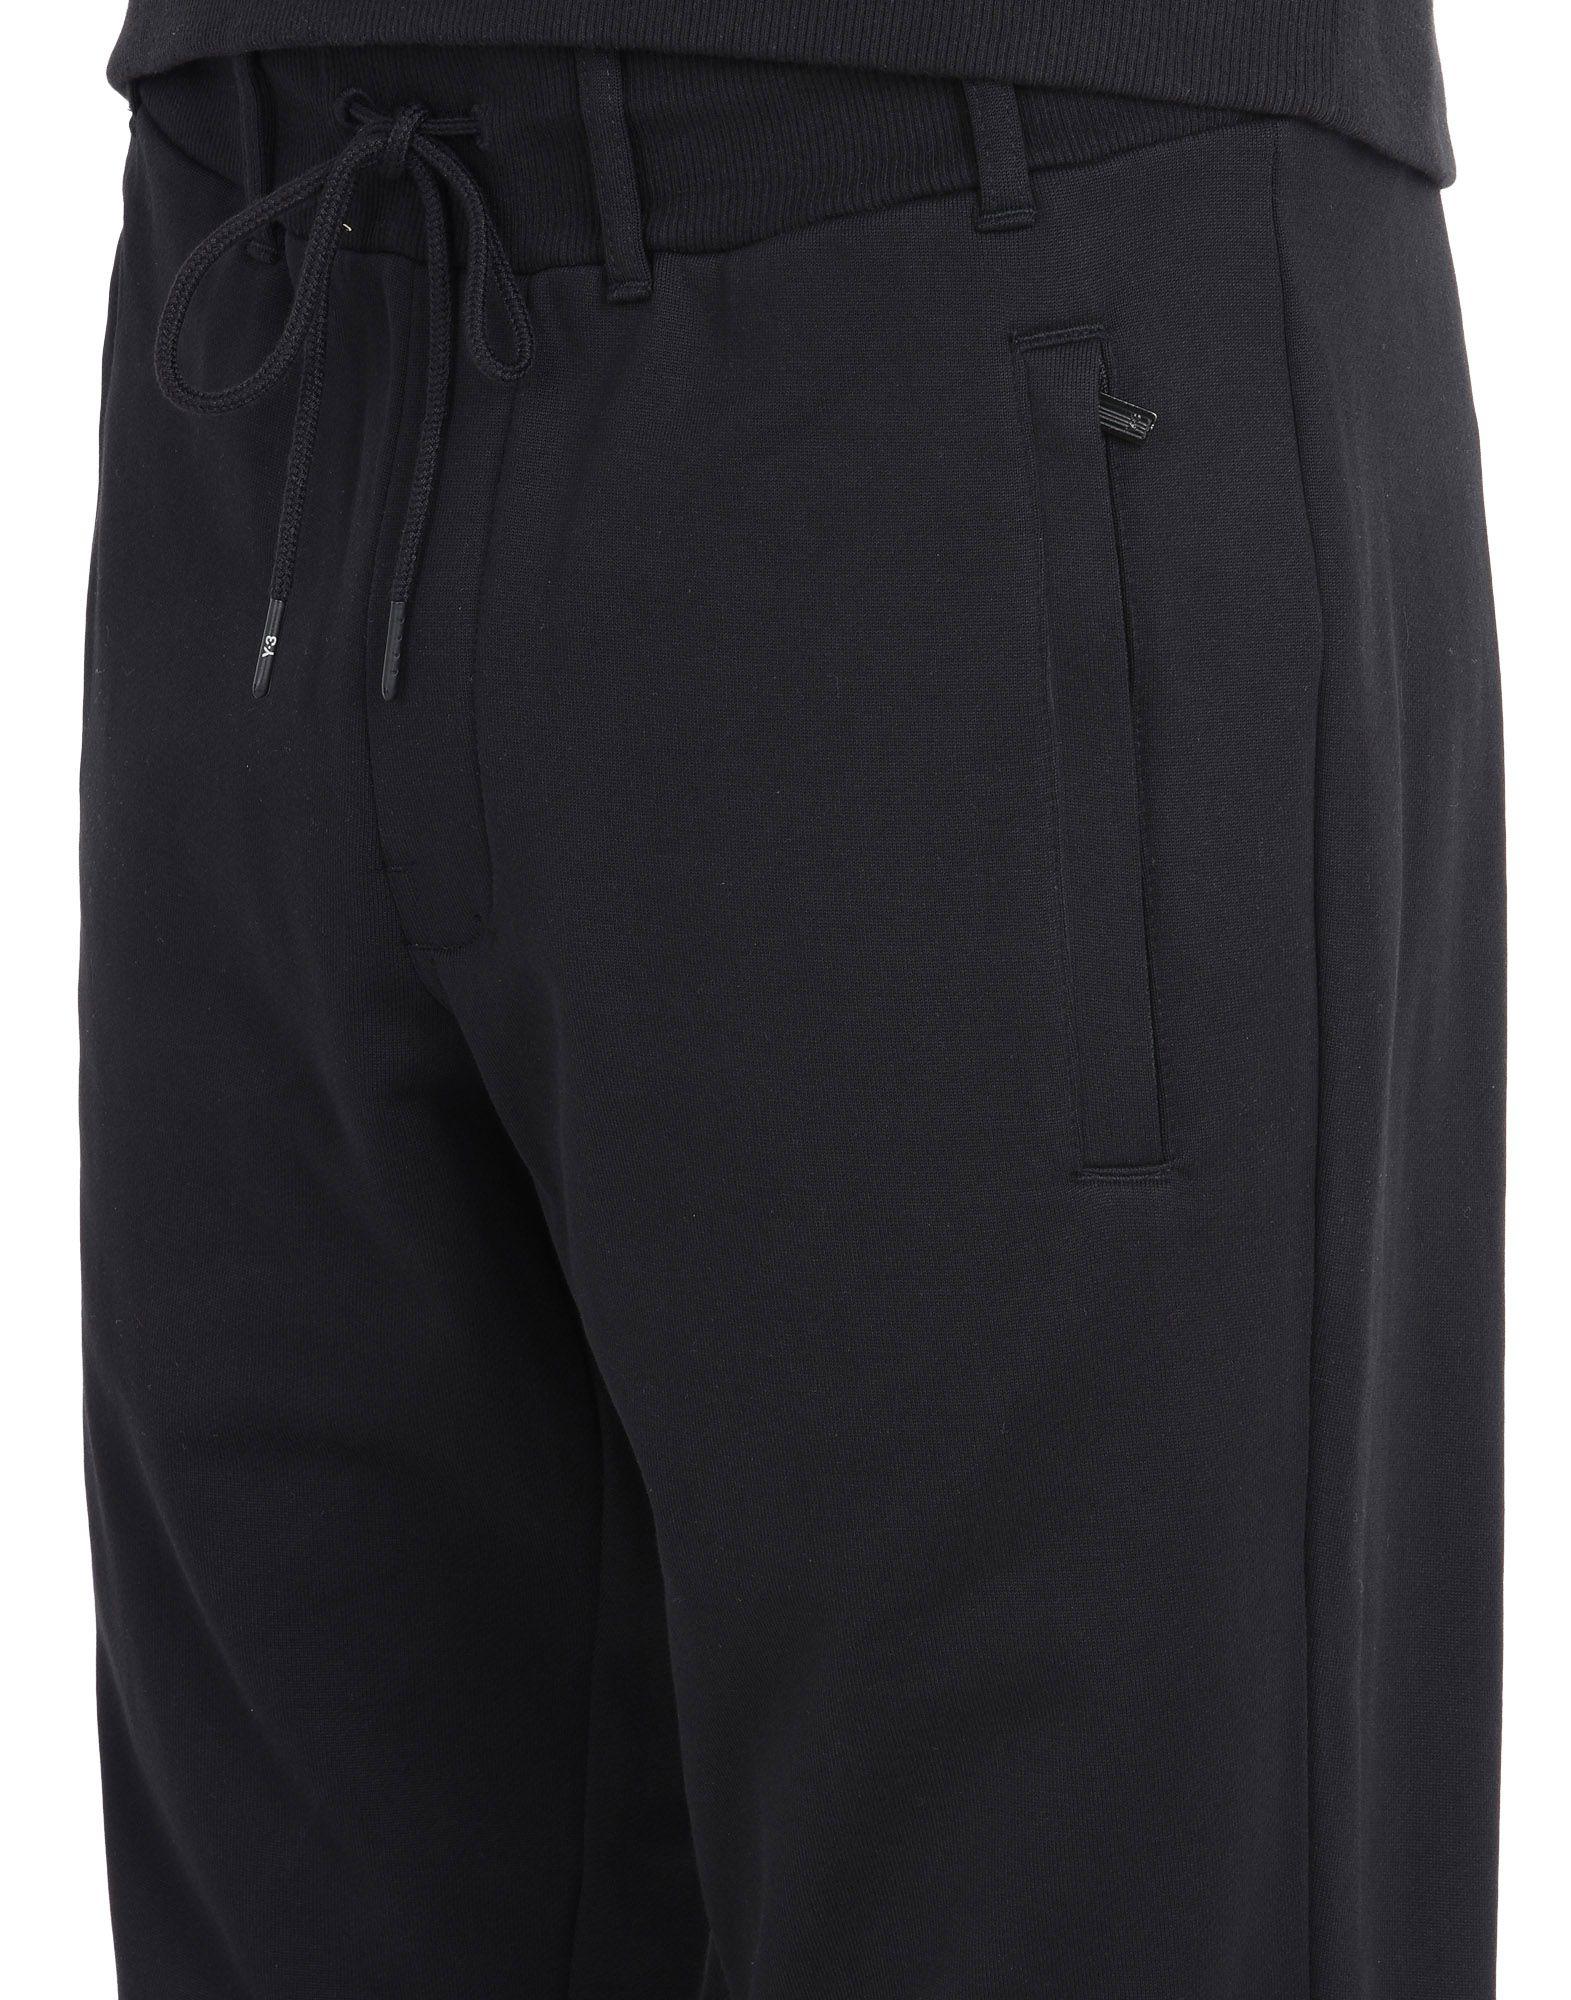 Y-3 CLASSIC FT CUFF PANT PANTS man Y-3 adidas